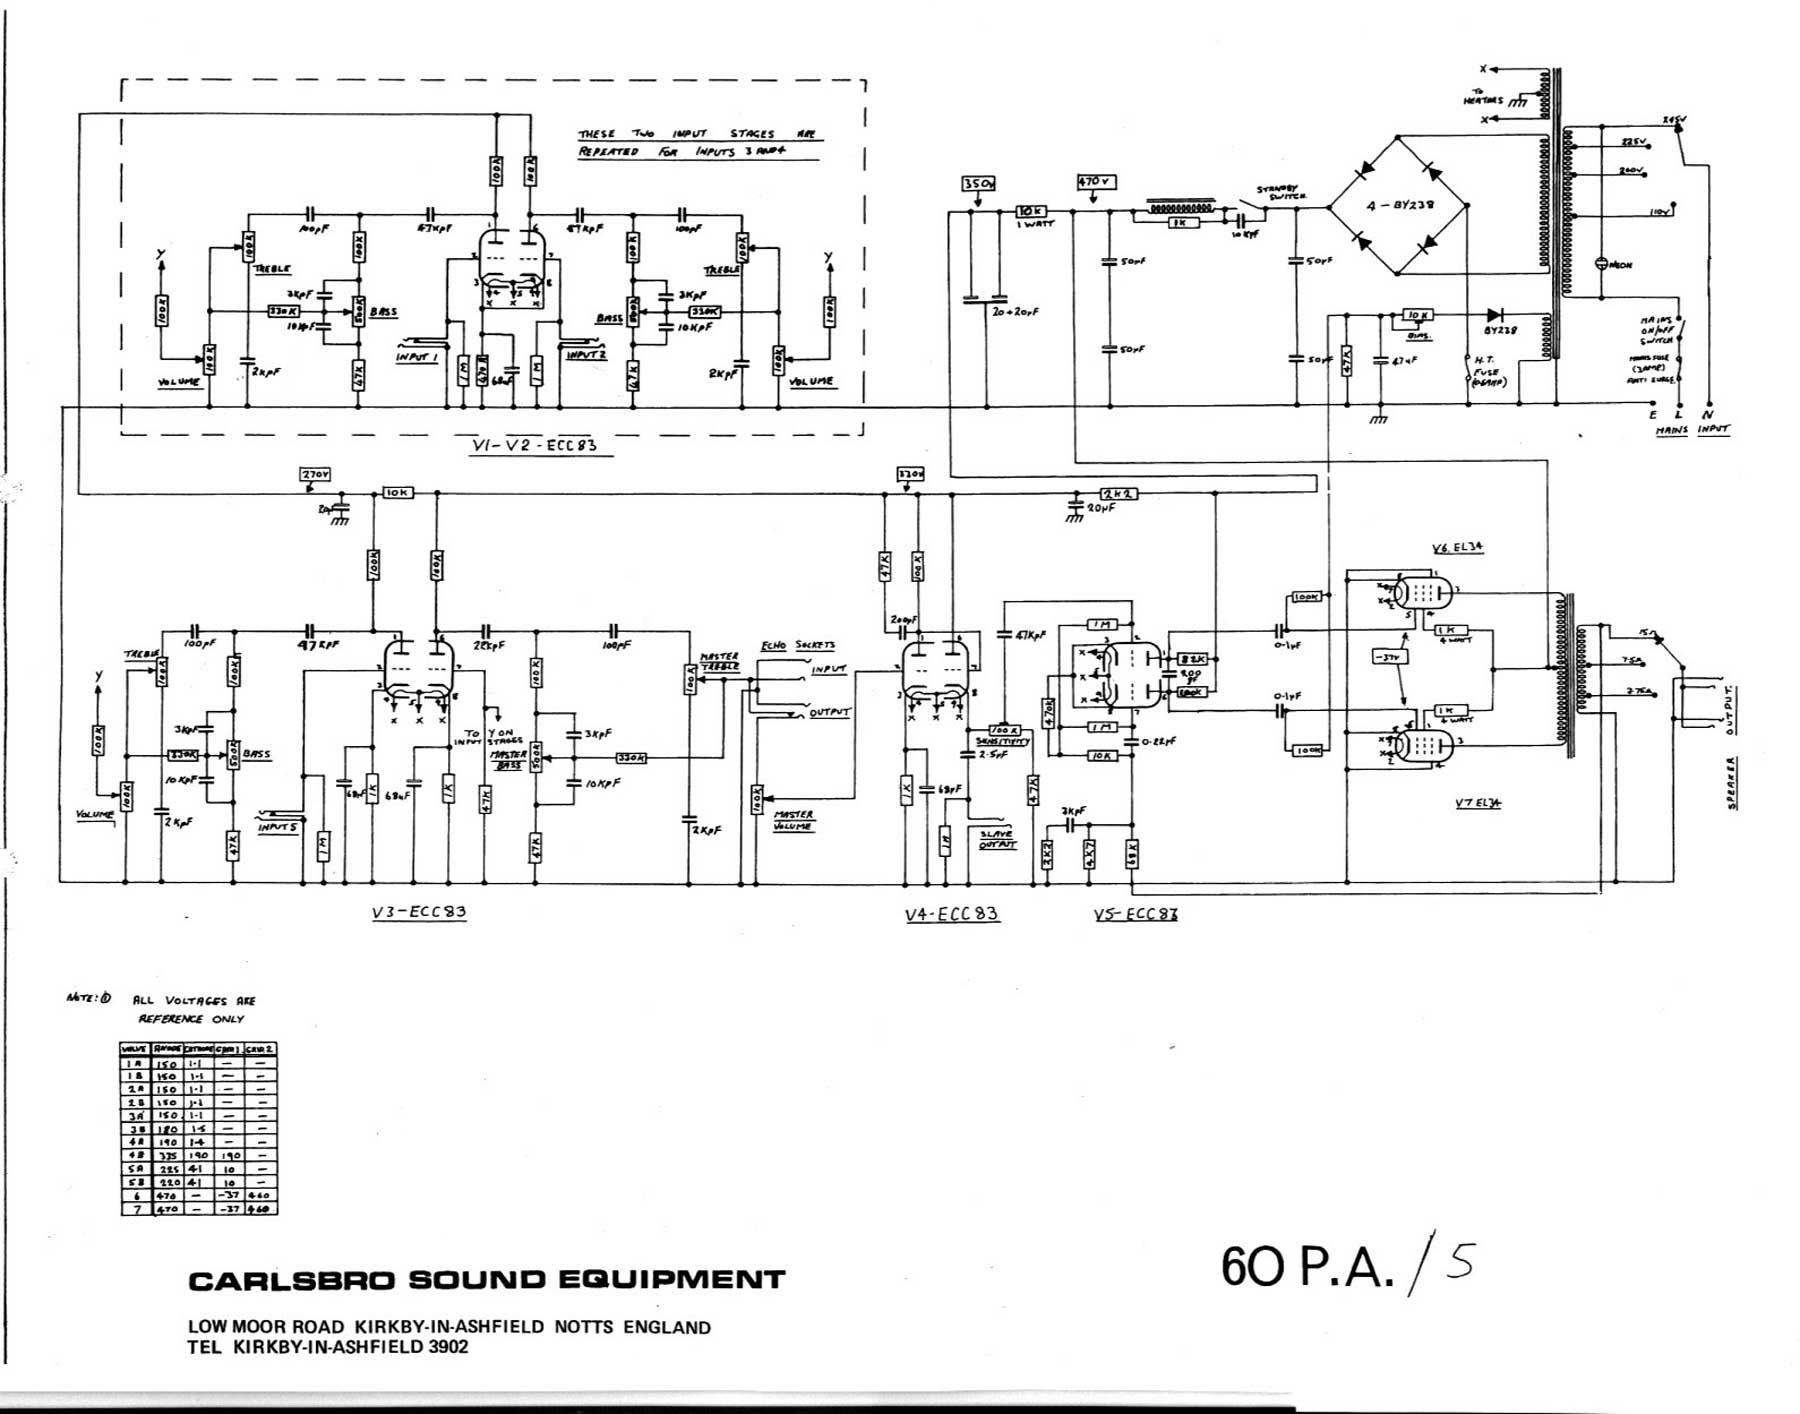 Carlsbro 60 PA 5 Amp Schematic